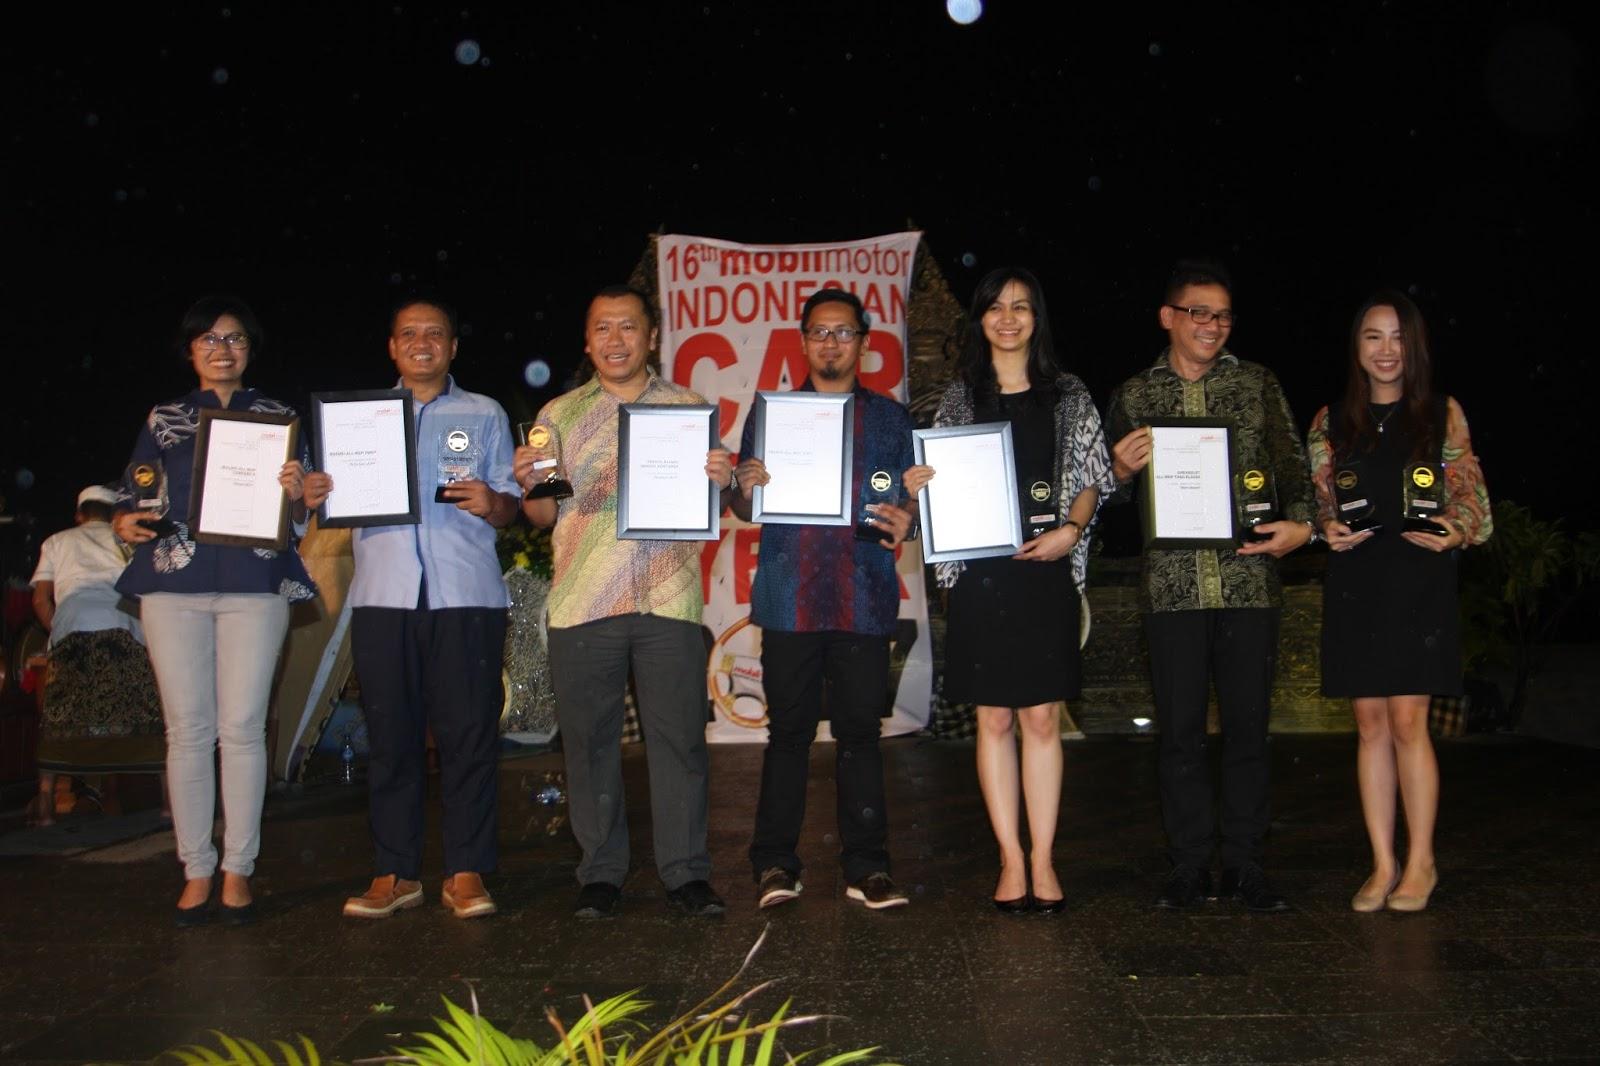 Konsumsi Bbm All New Kijang Innova Diesel Harga 2.4 V A/t Lux Mobilmotor Indonesian Car Of The Year Telurkan 13 Kategori ...